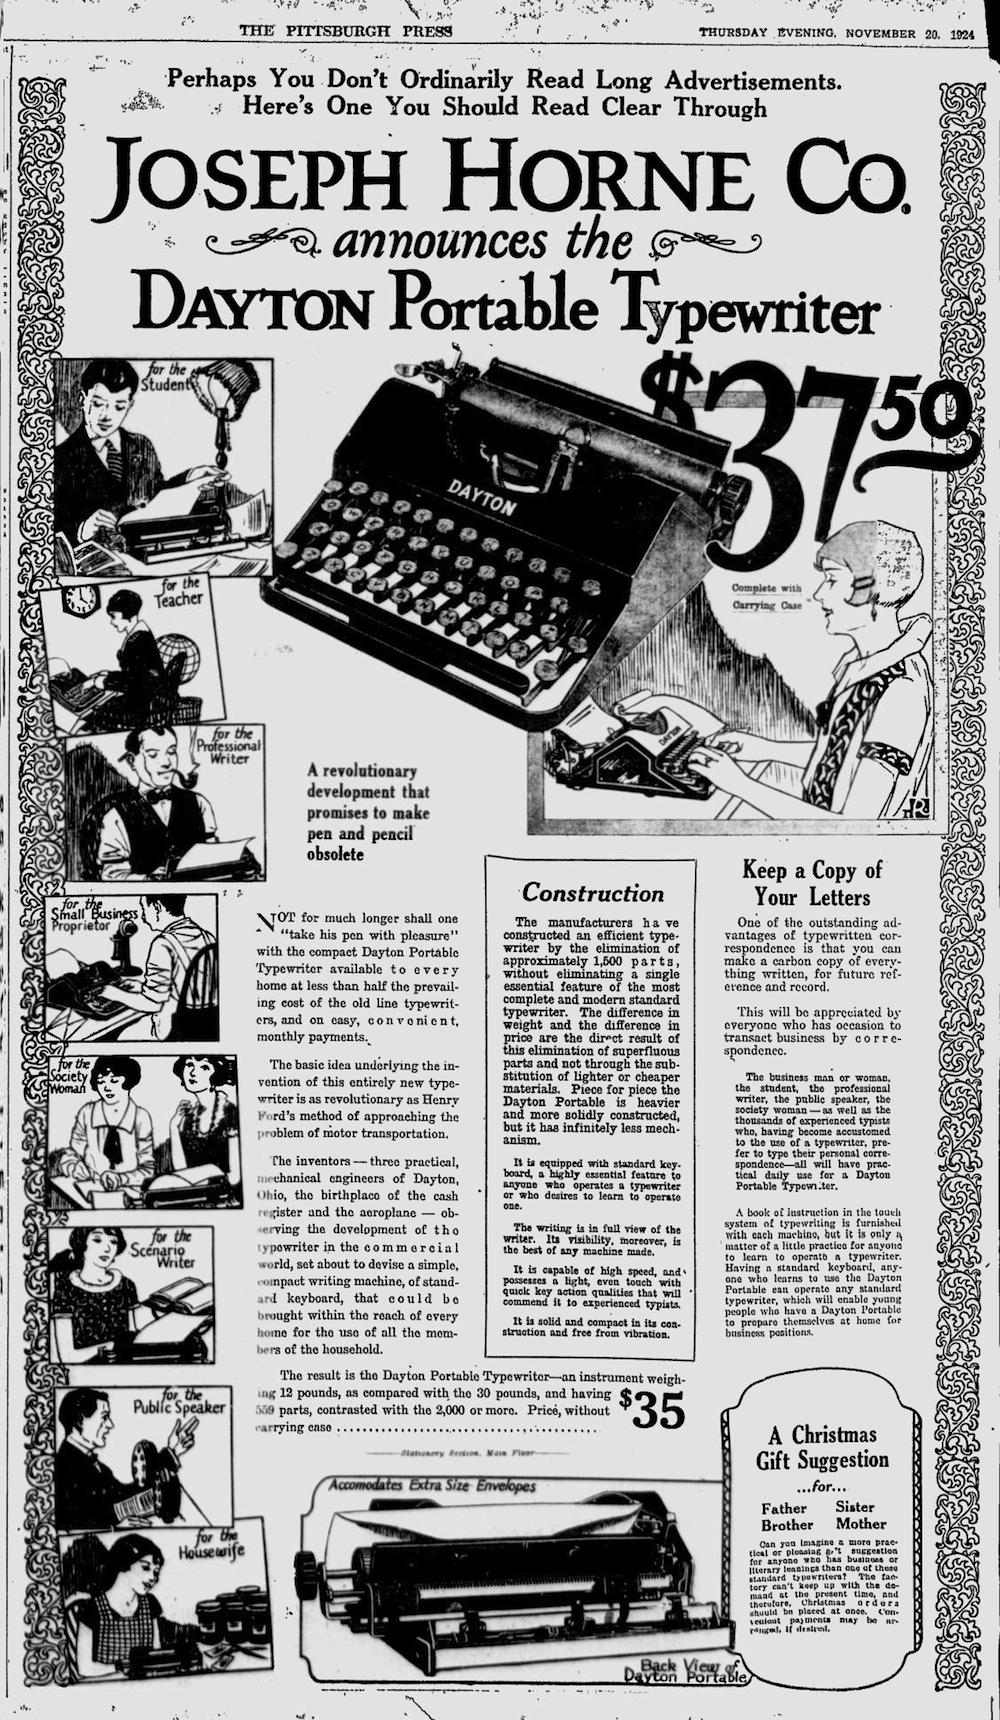 The Pittsburgh Press - Nov 20, 1924